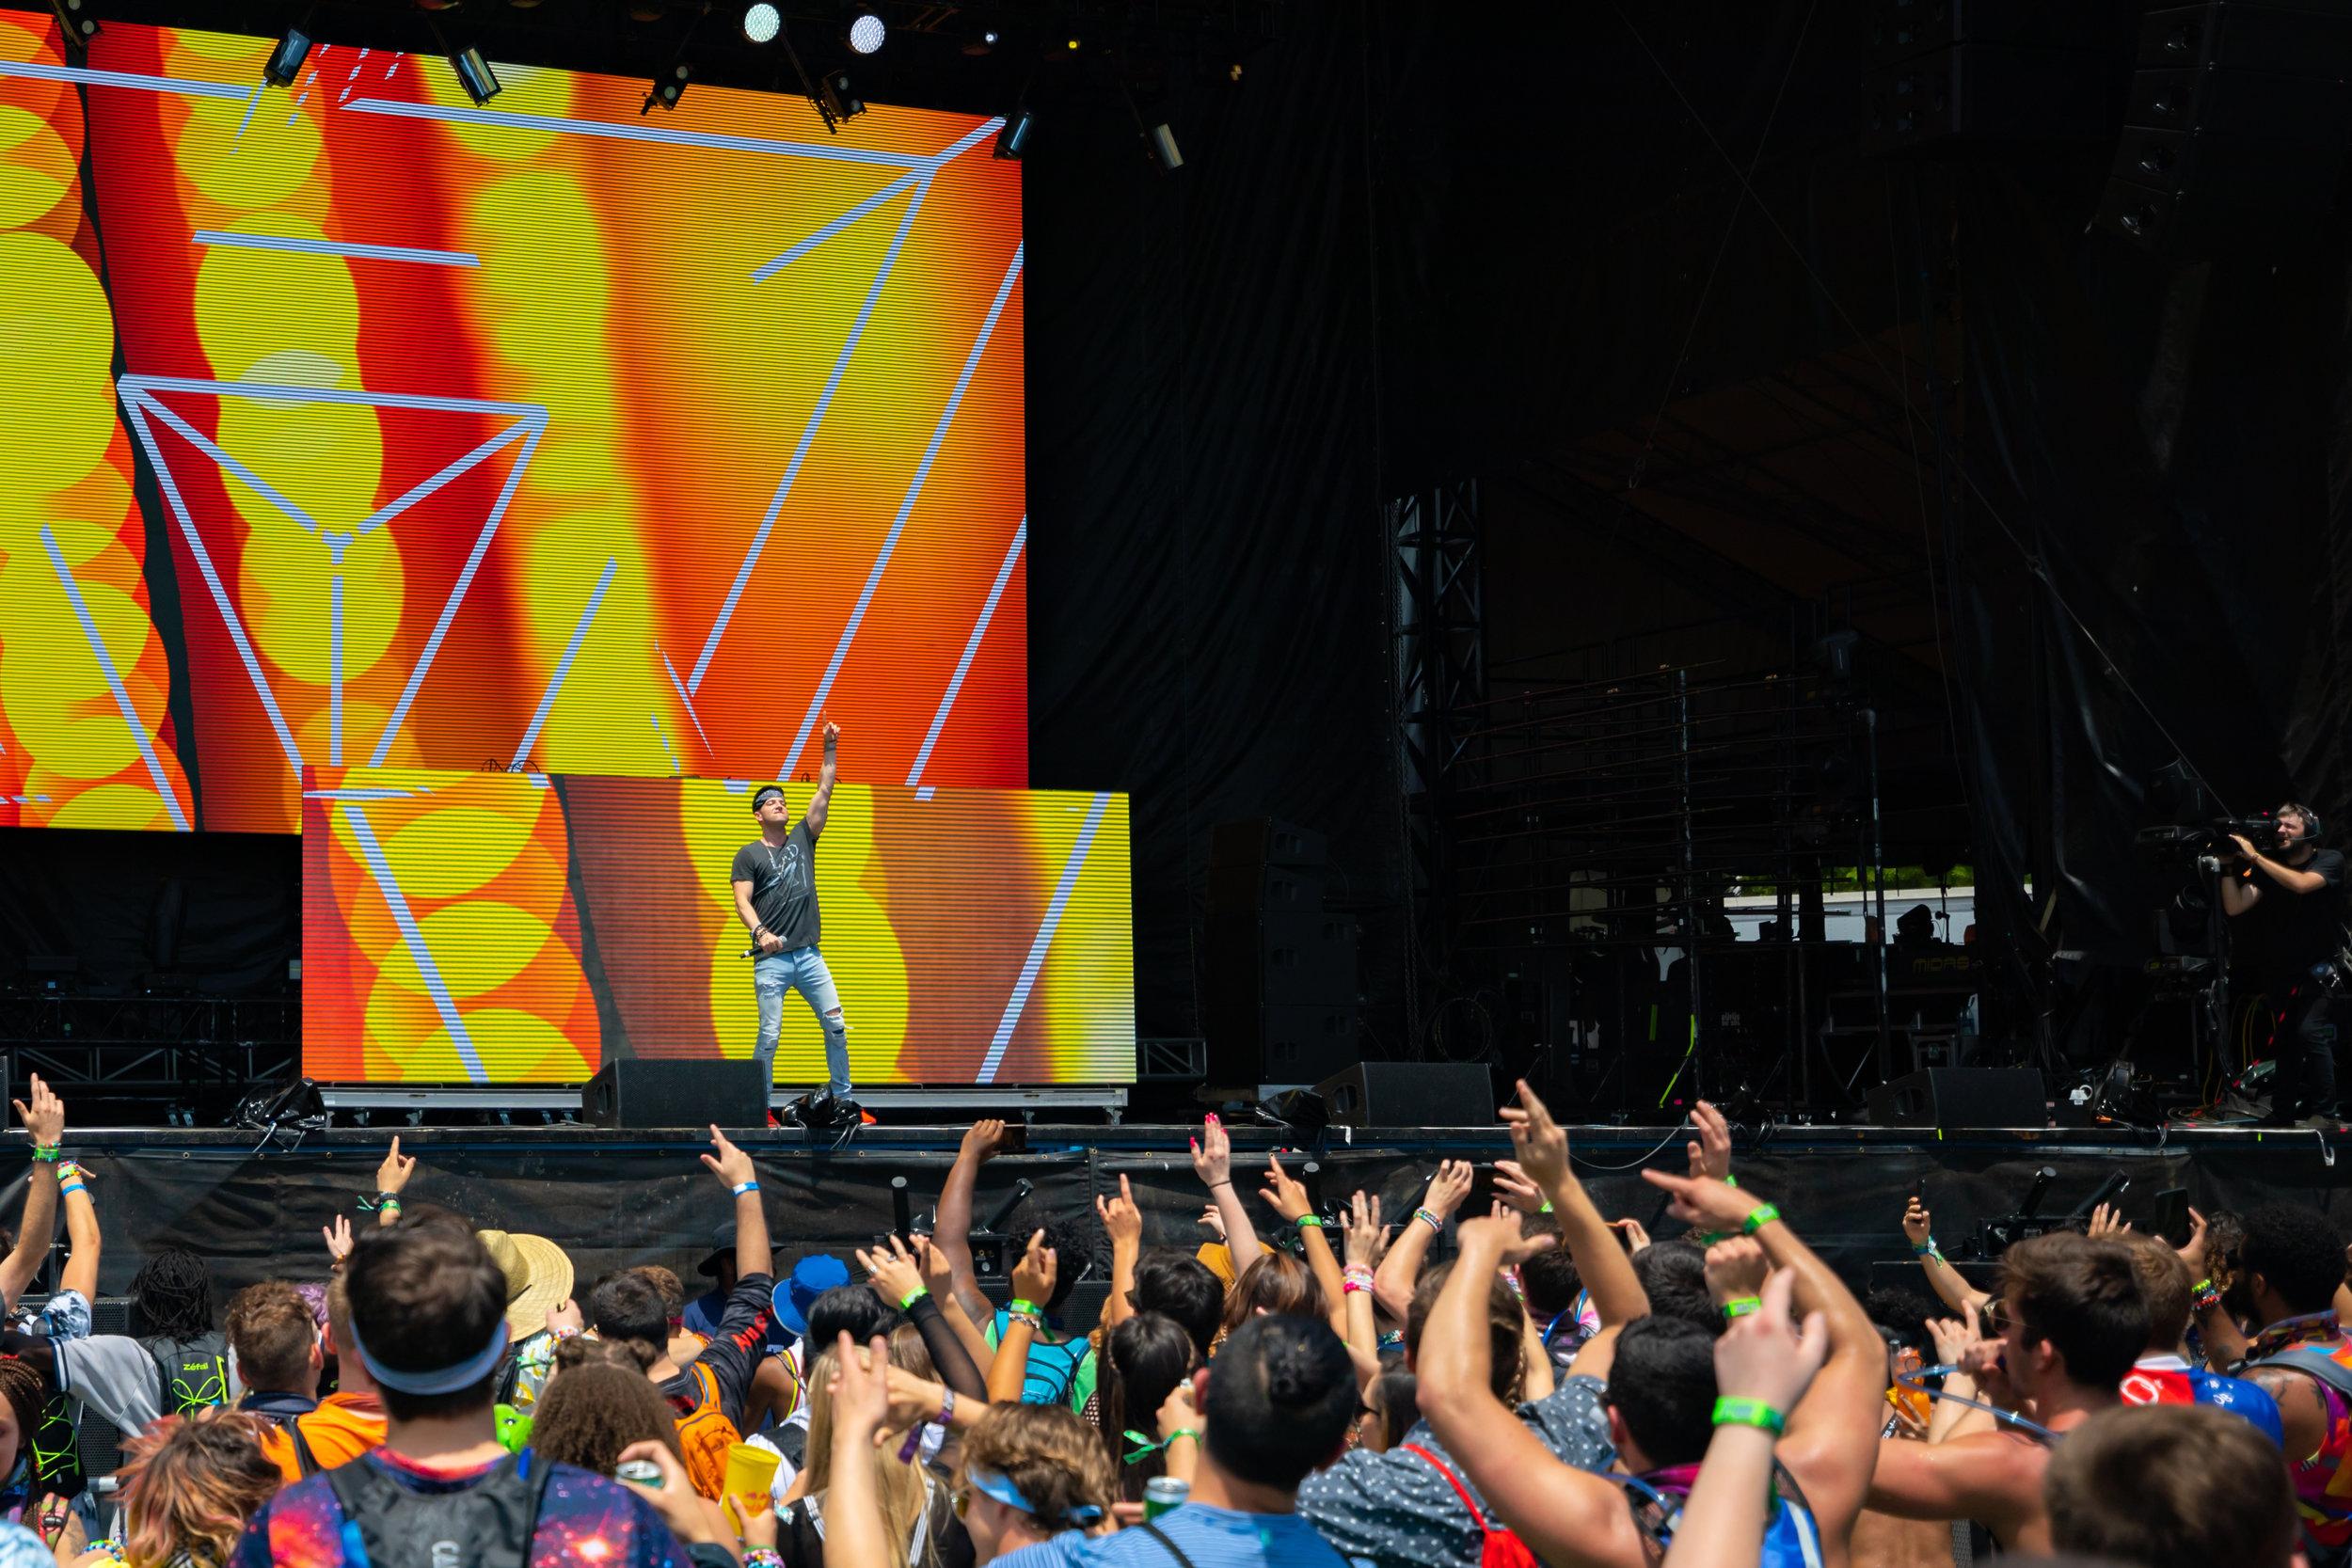 PAZ performing at Shaky Beats Festival 2019 in Atlanta, Georgia. Photo courtesy of Alive Coverage.